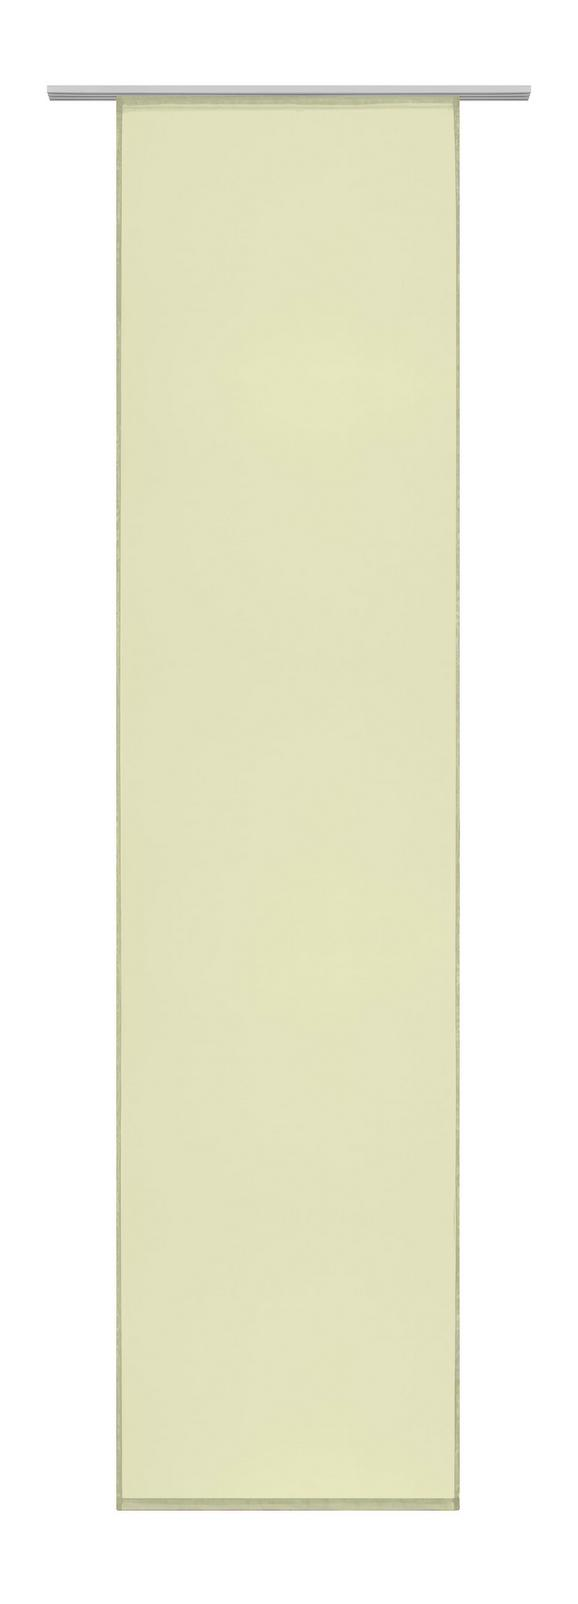 Flächenvorhang Flipp in Grün, ca. 60x245cm - Grün, Textil (60/245cm) - Based